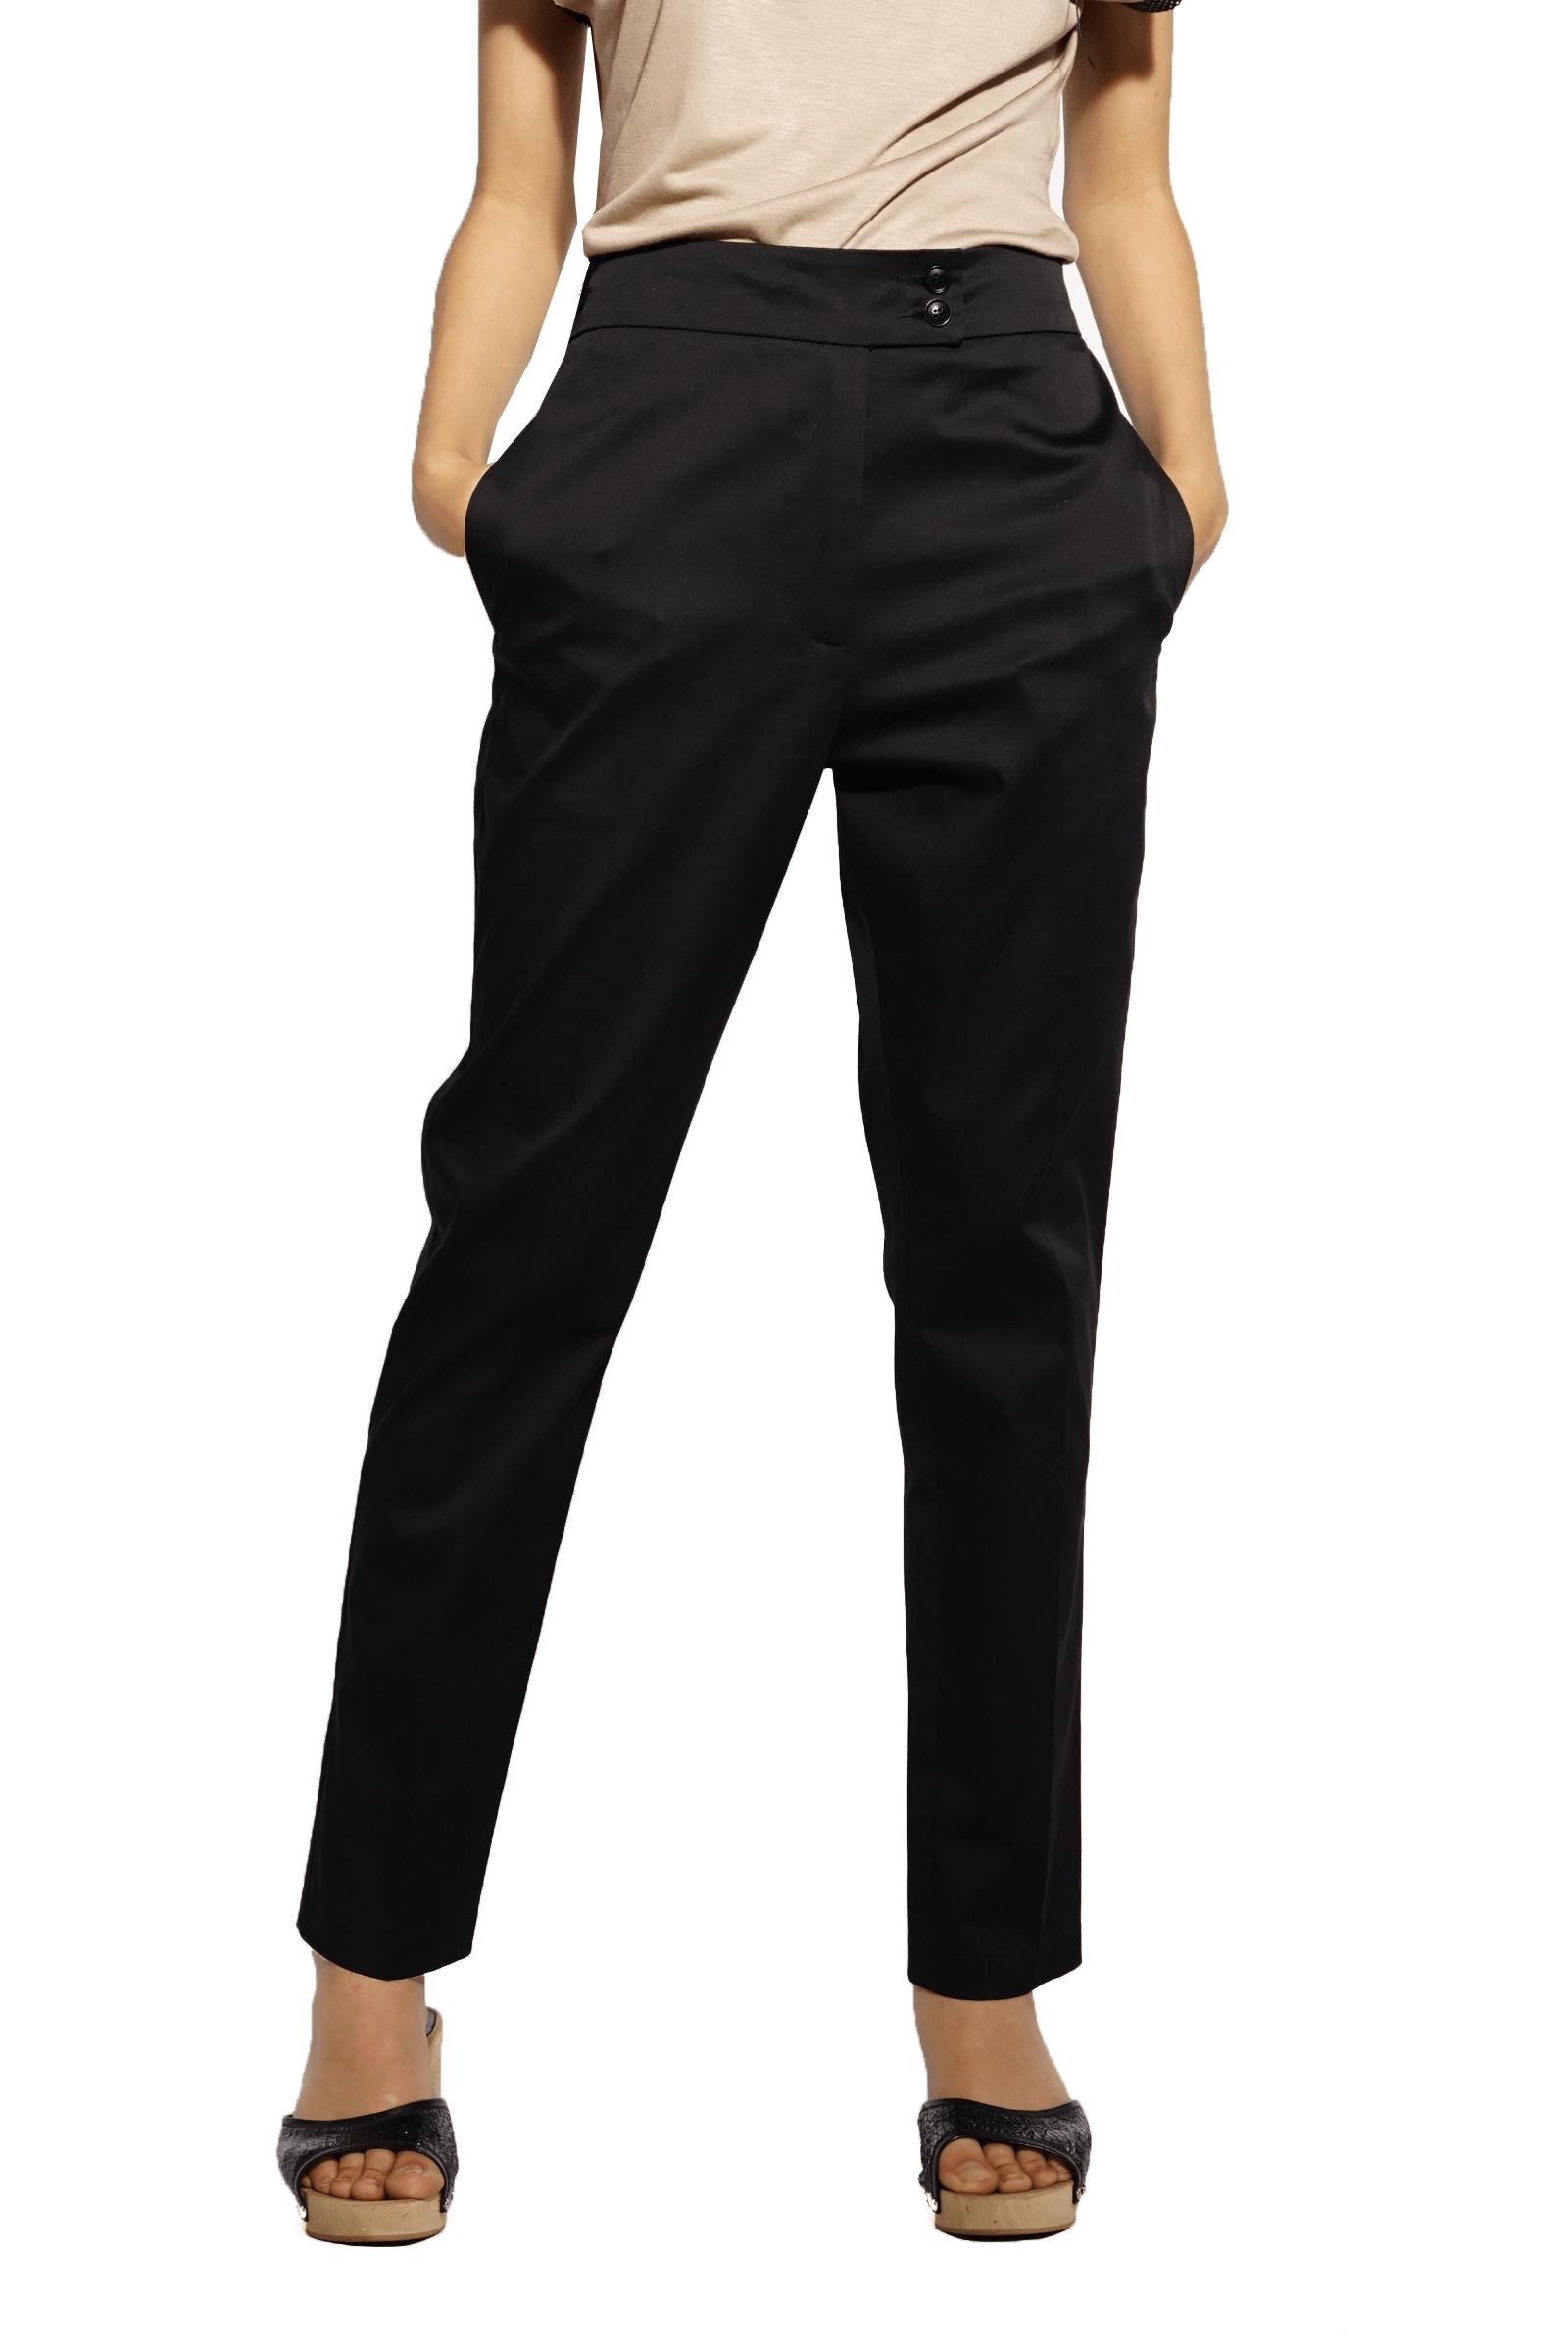 Black pants with elastic at...